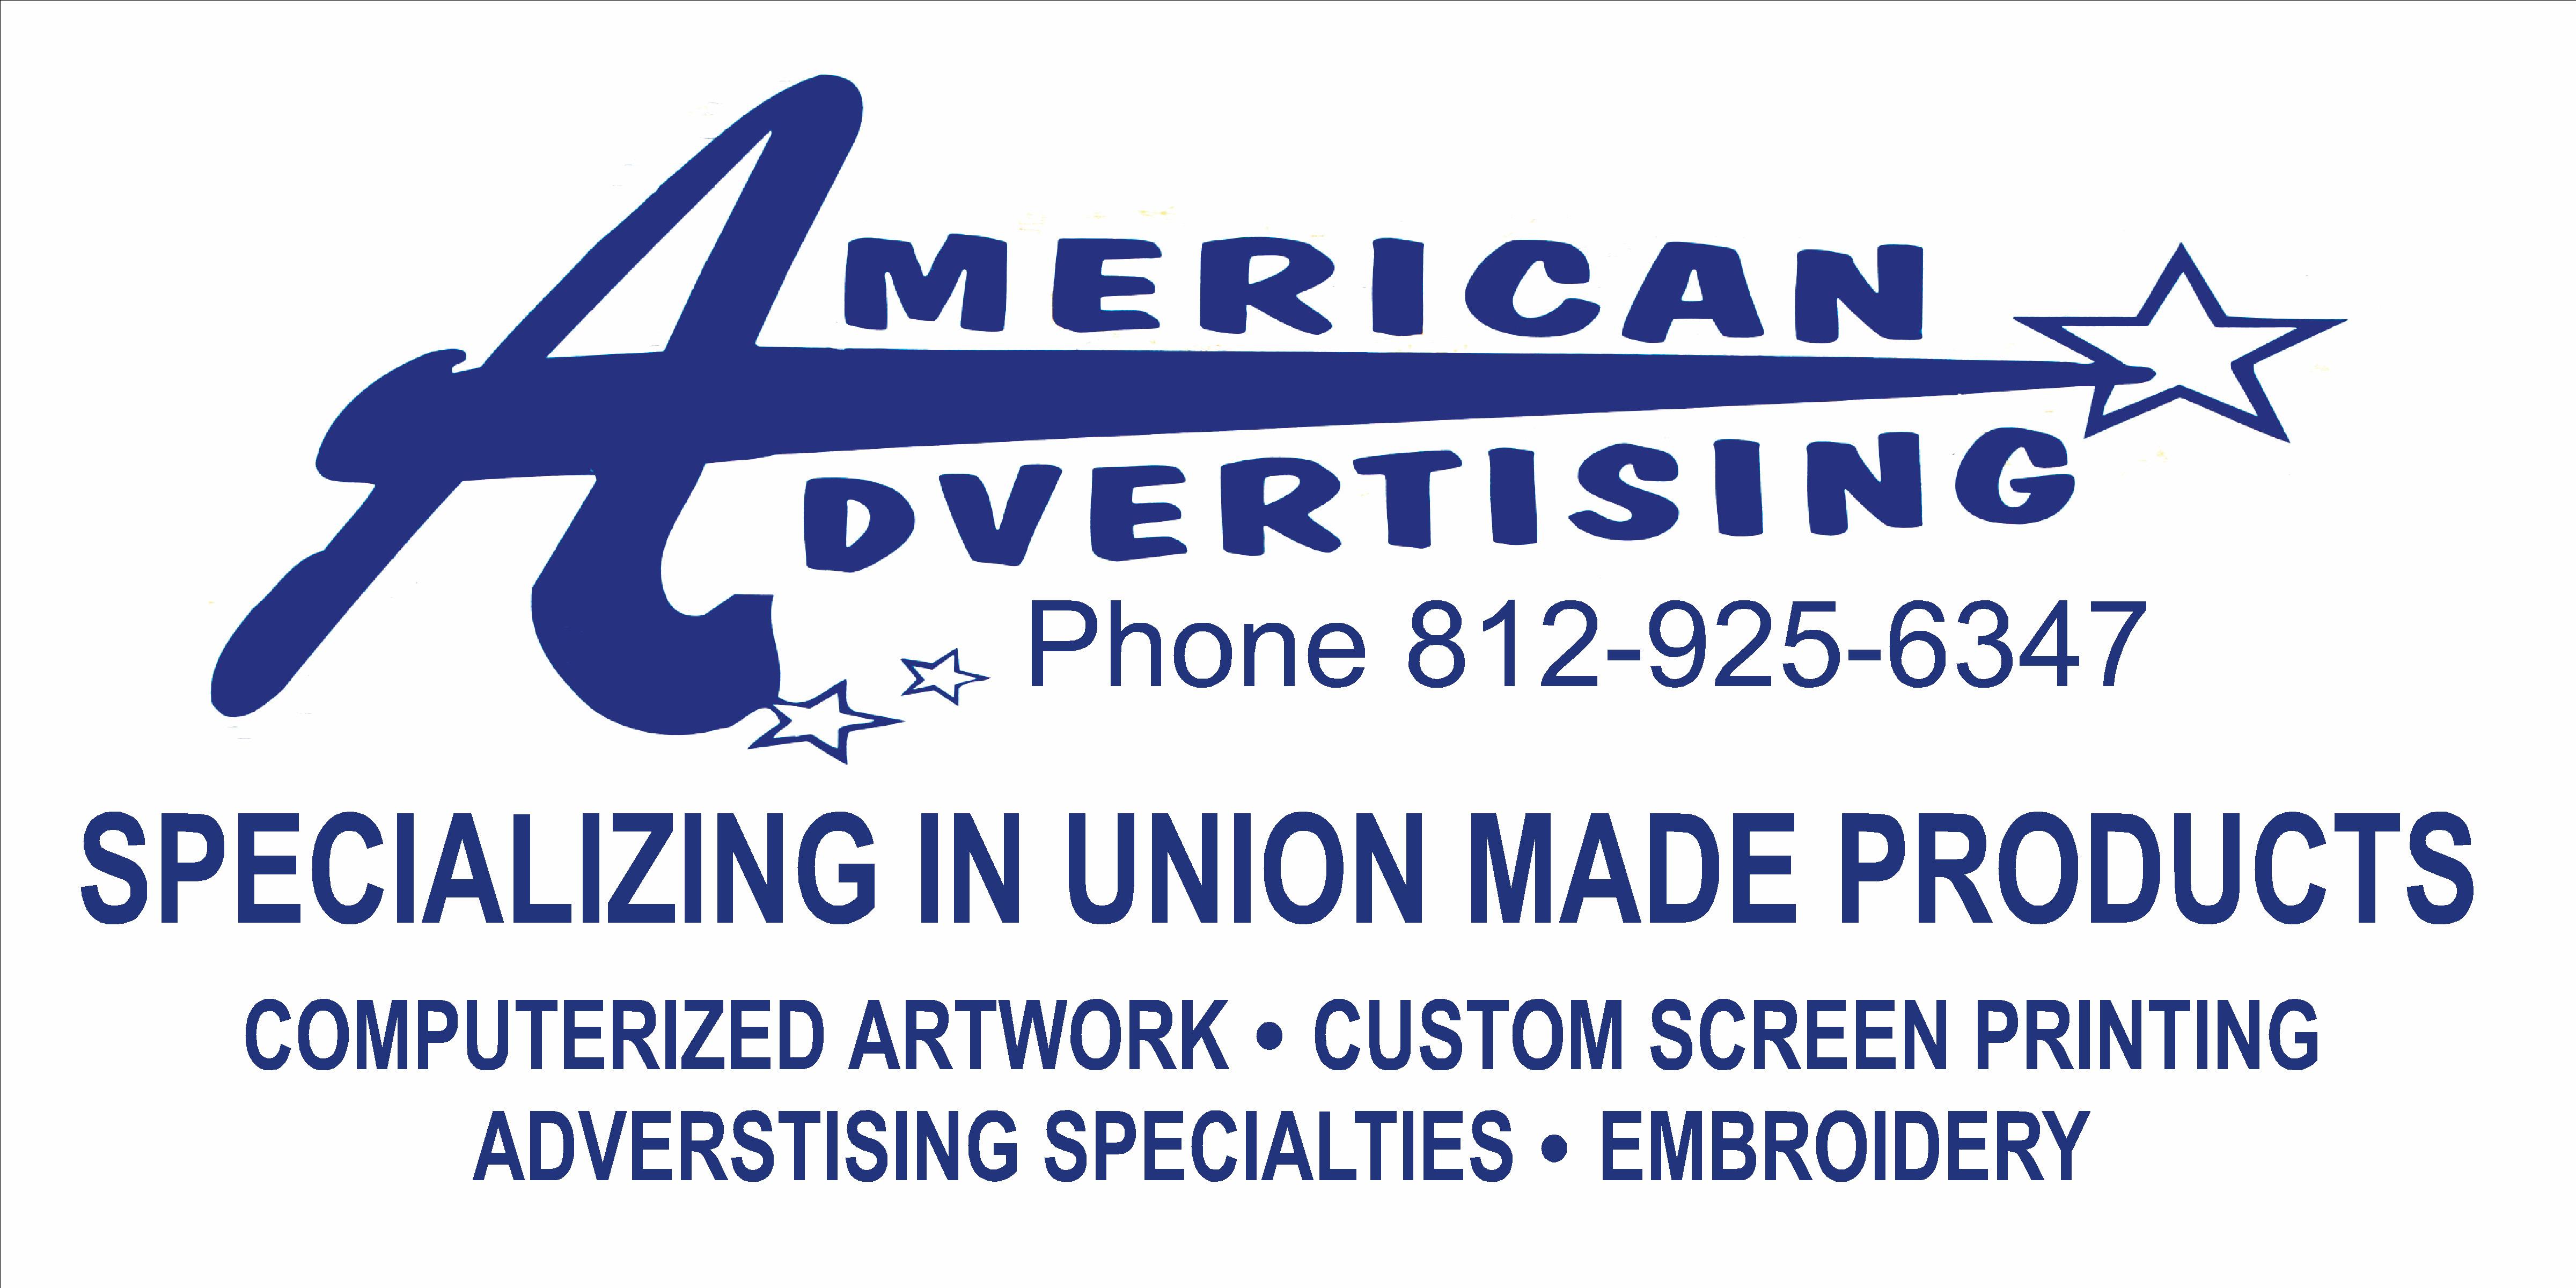 American-Advertising